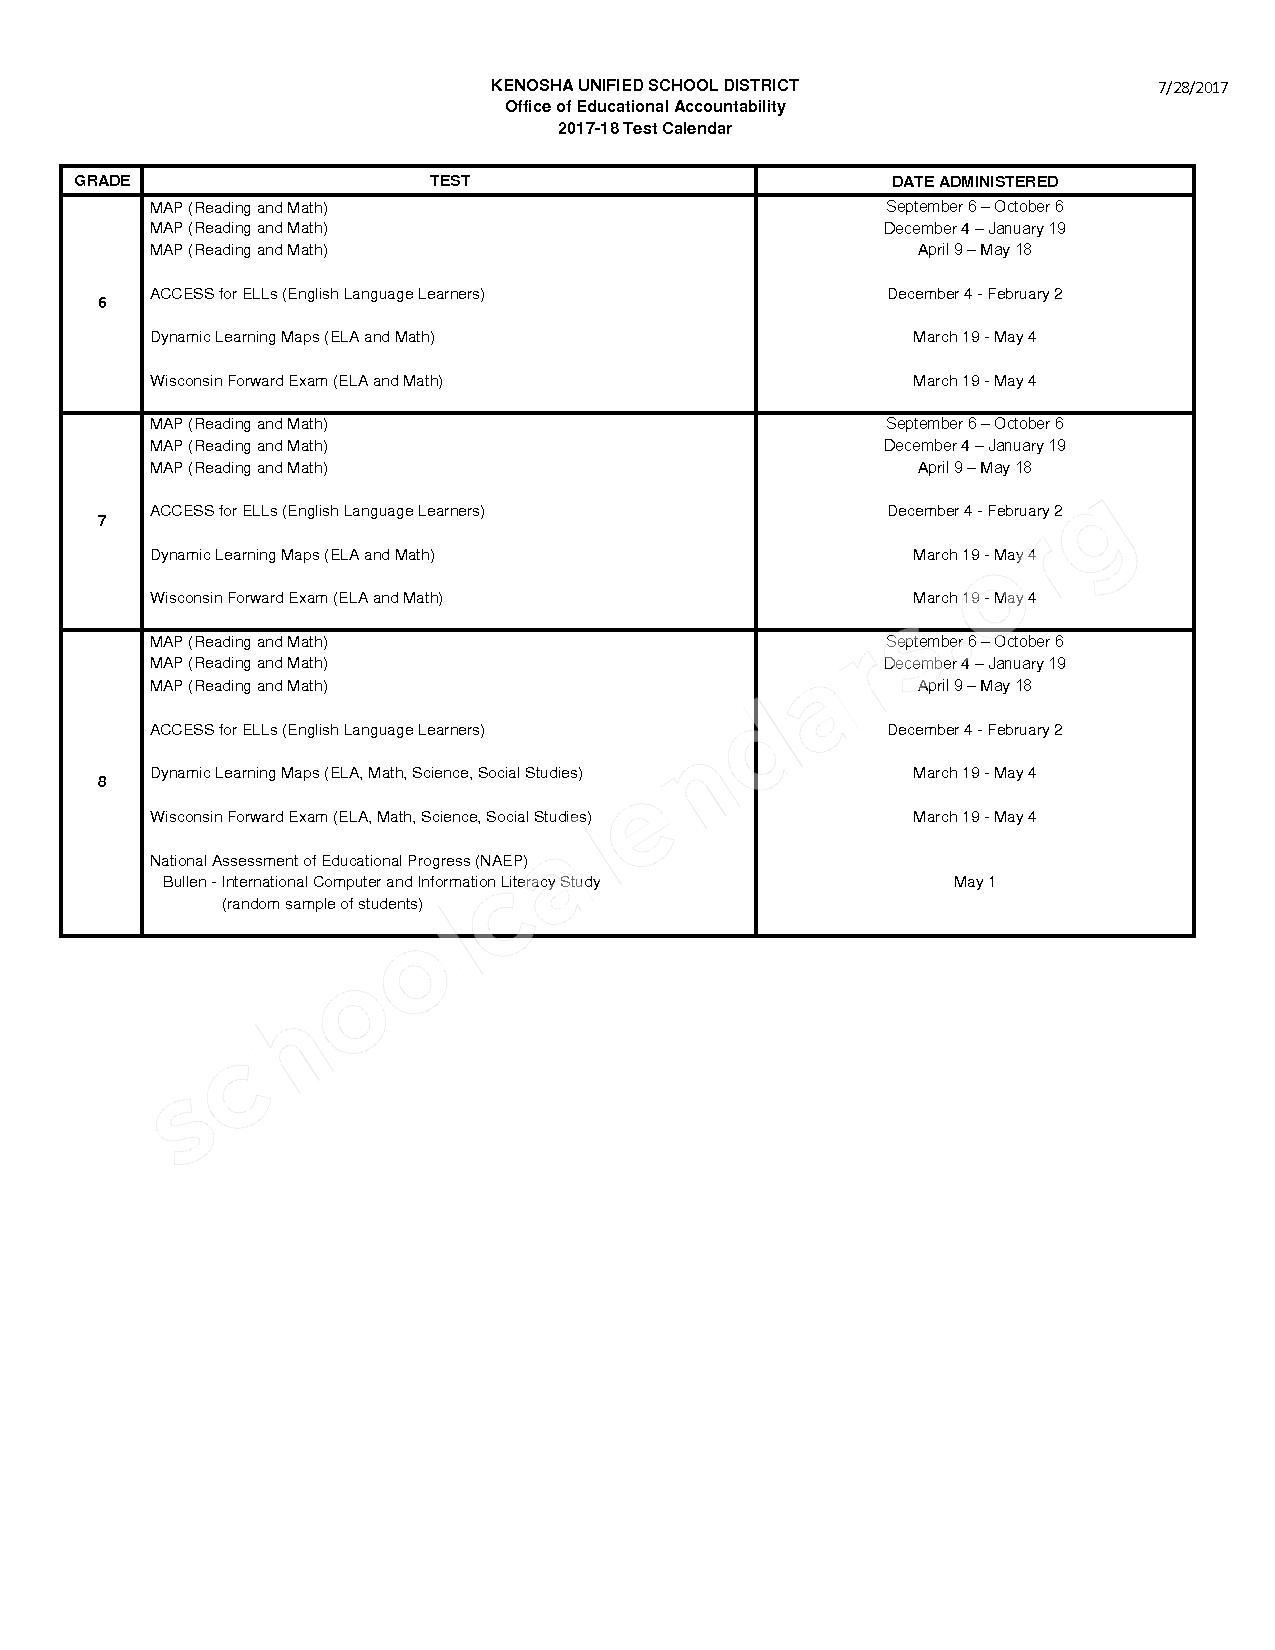 2017 - 2018 Test Calendar – Kenosha School District – page 2